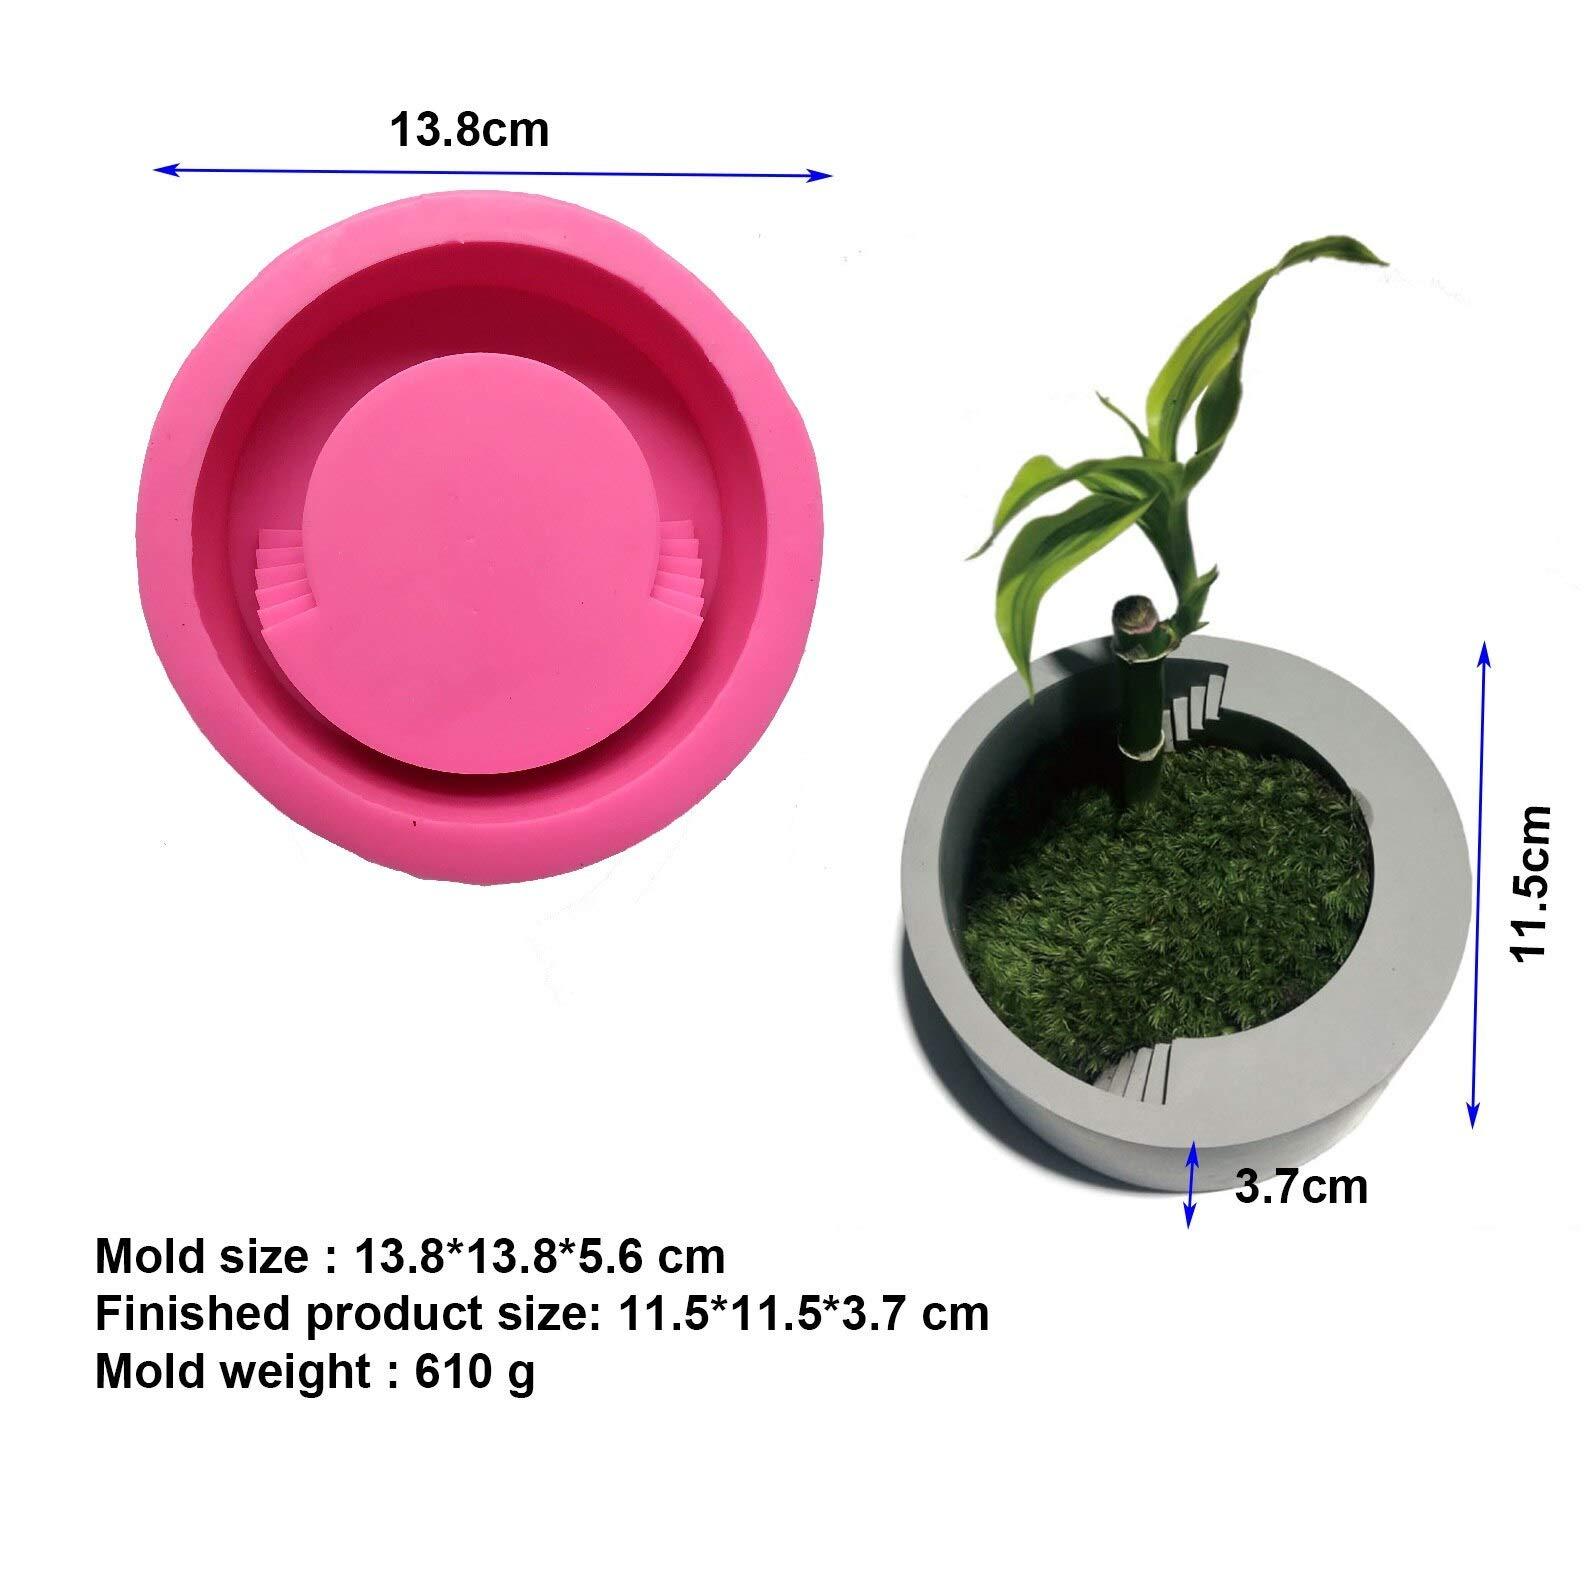 Concrete Planter Best Quality - Clay Molds - Modern Simple Concrete Craft Decorating Flowerpot Silicone Mold Handmade Desktop Cement Planter Molds for Flower Pot vase Making - by GTIN - 1 PCs